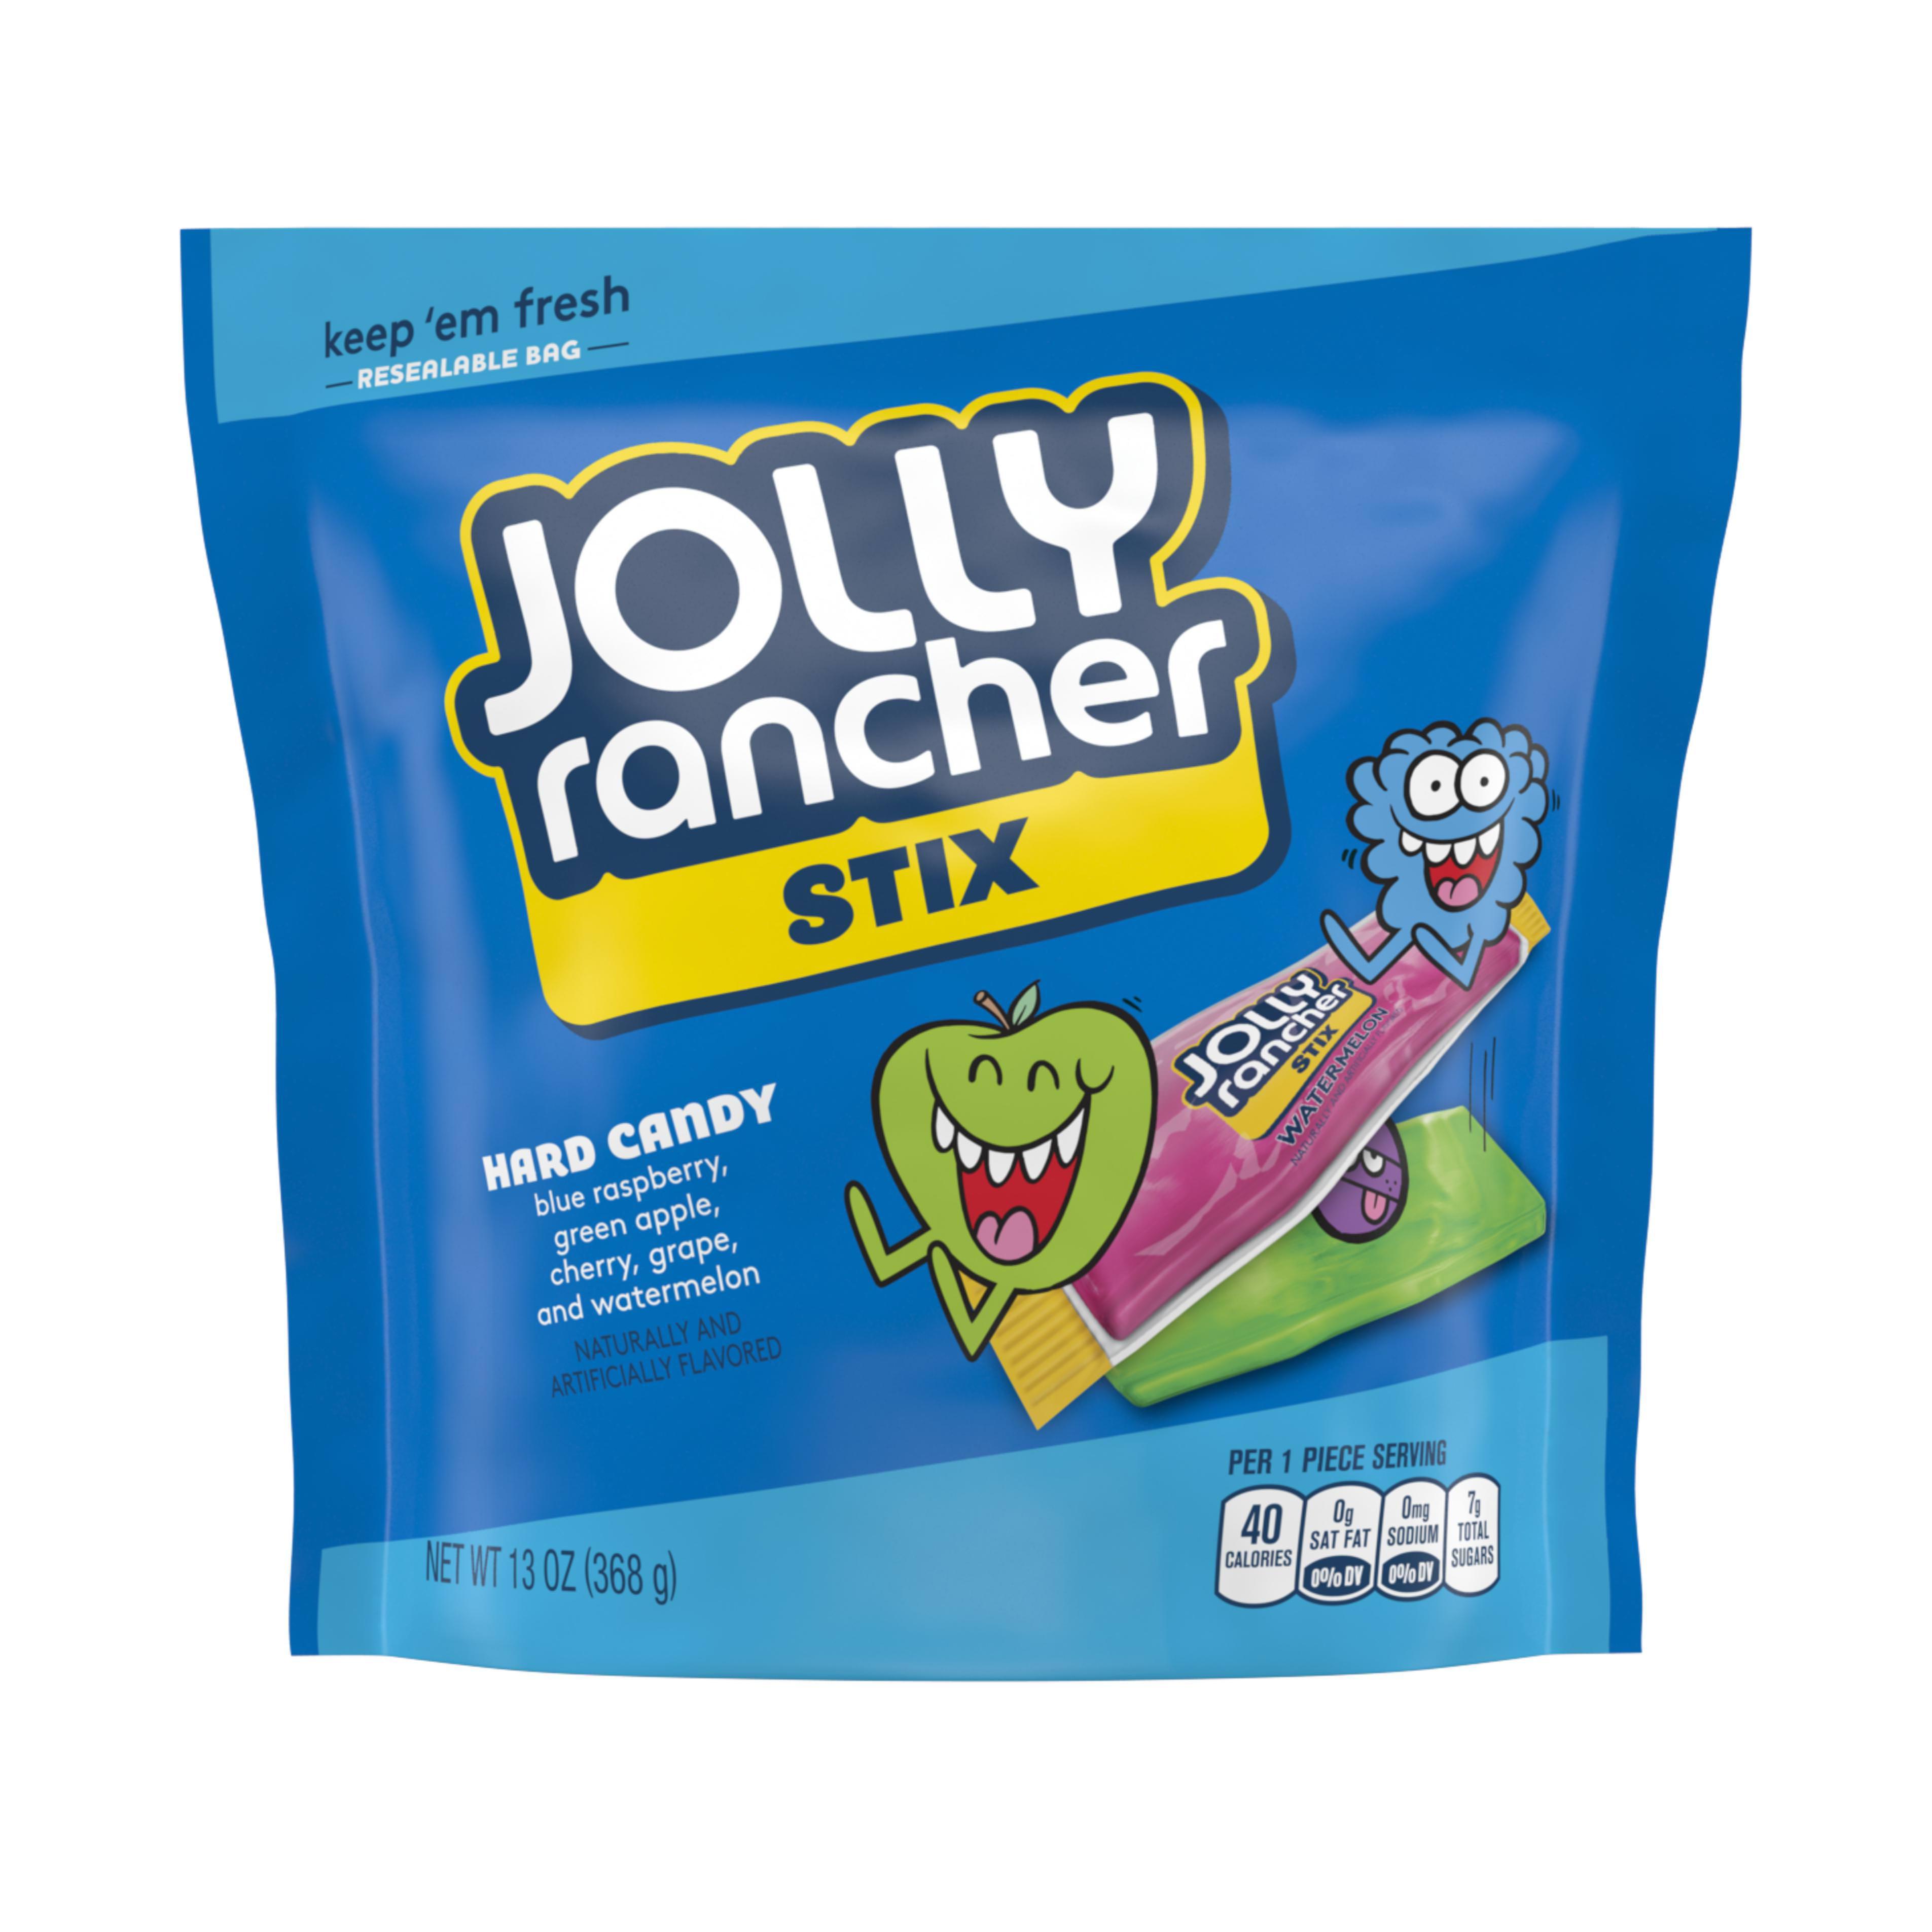 Jolly Rancher Stix Original Flavors Hard Candy, 13 Oz.